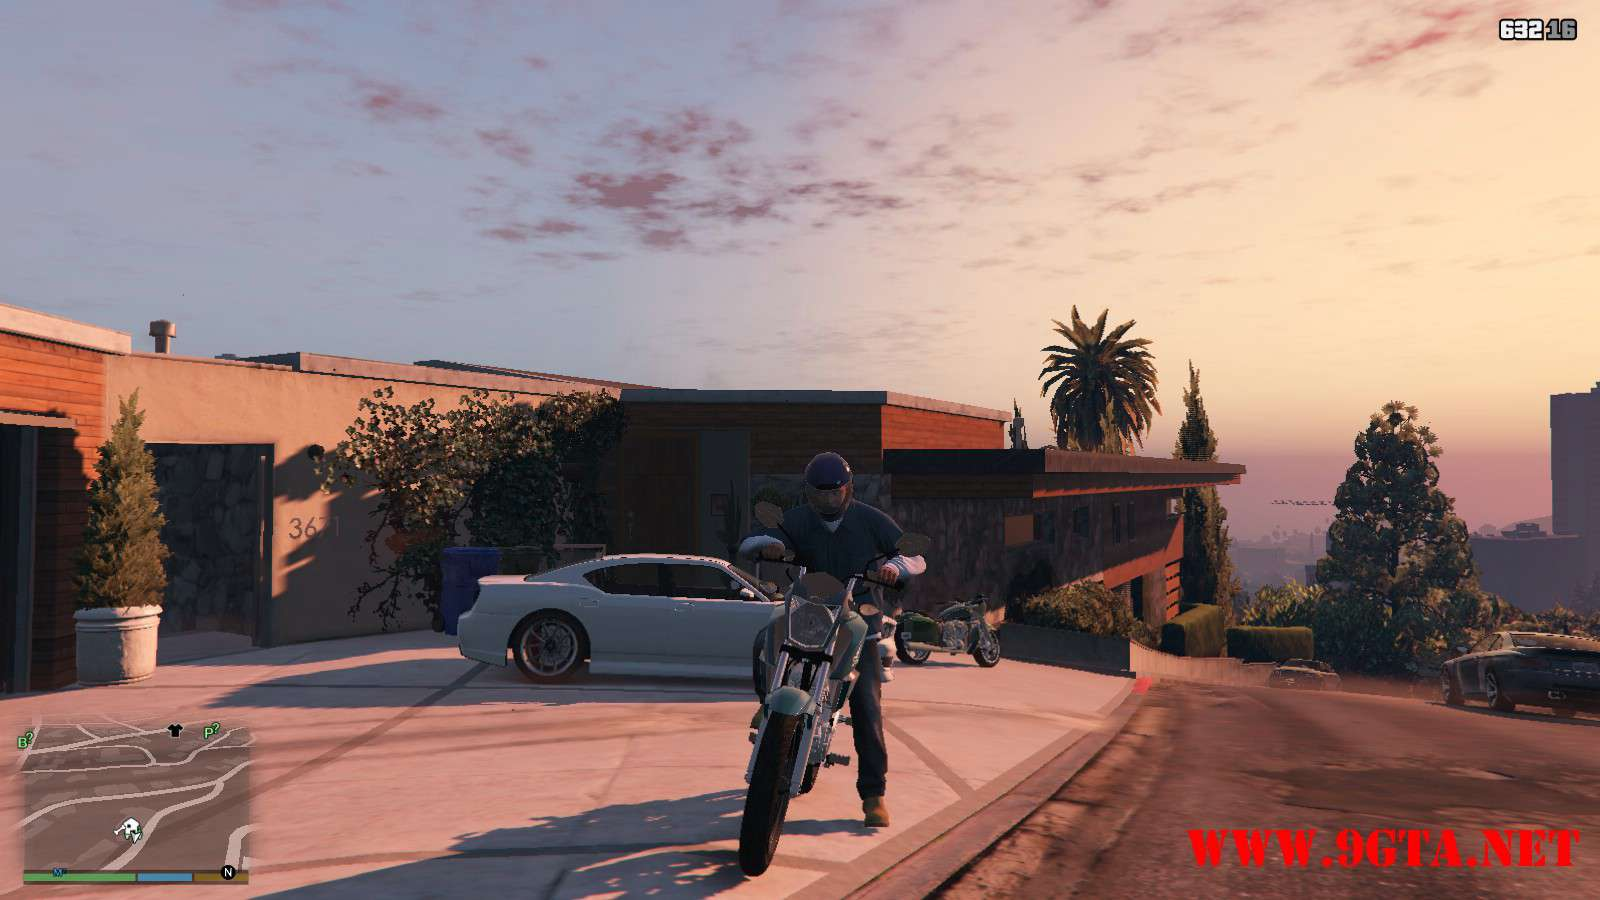 2016 Titan 160 Motocycle GTA5 Mods (5)